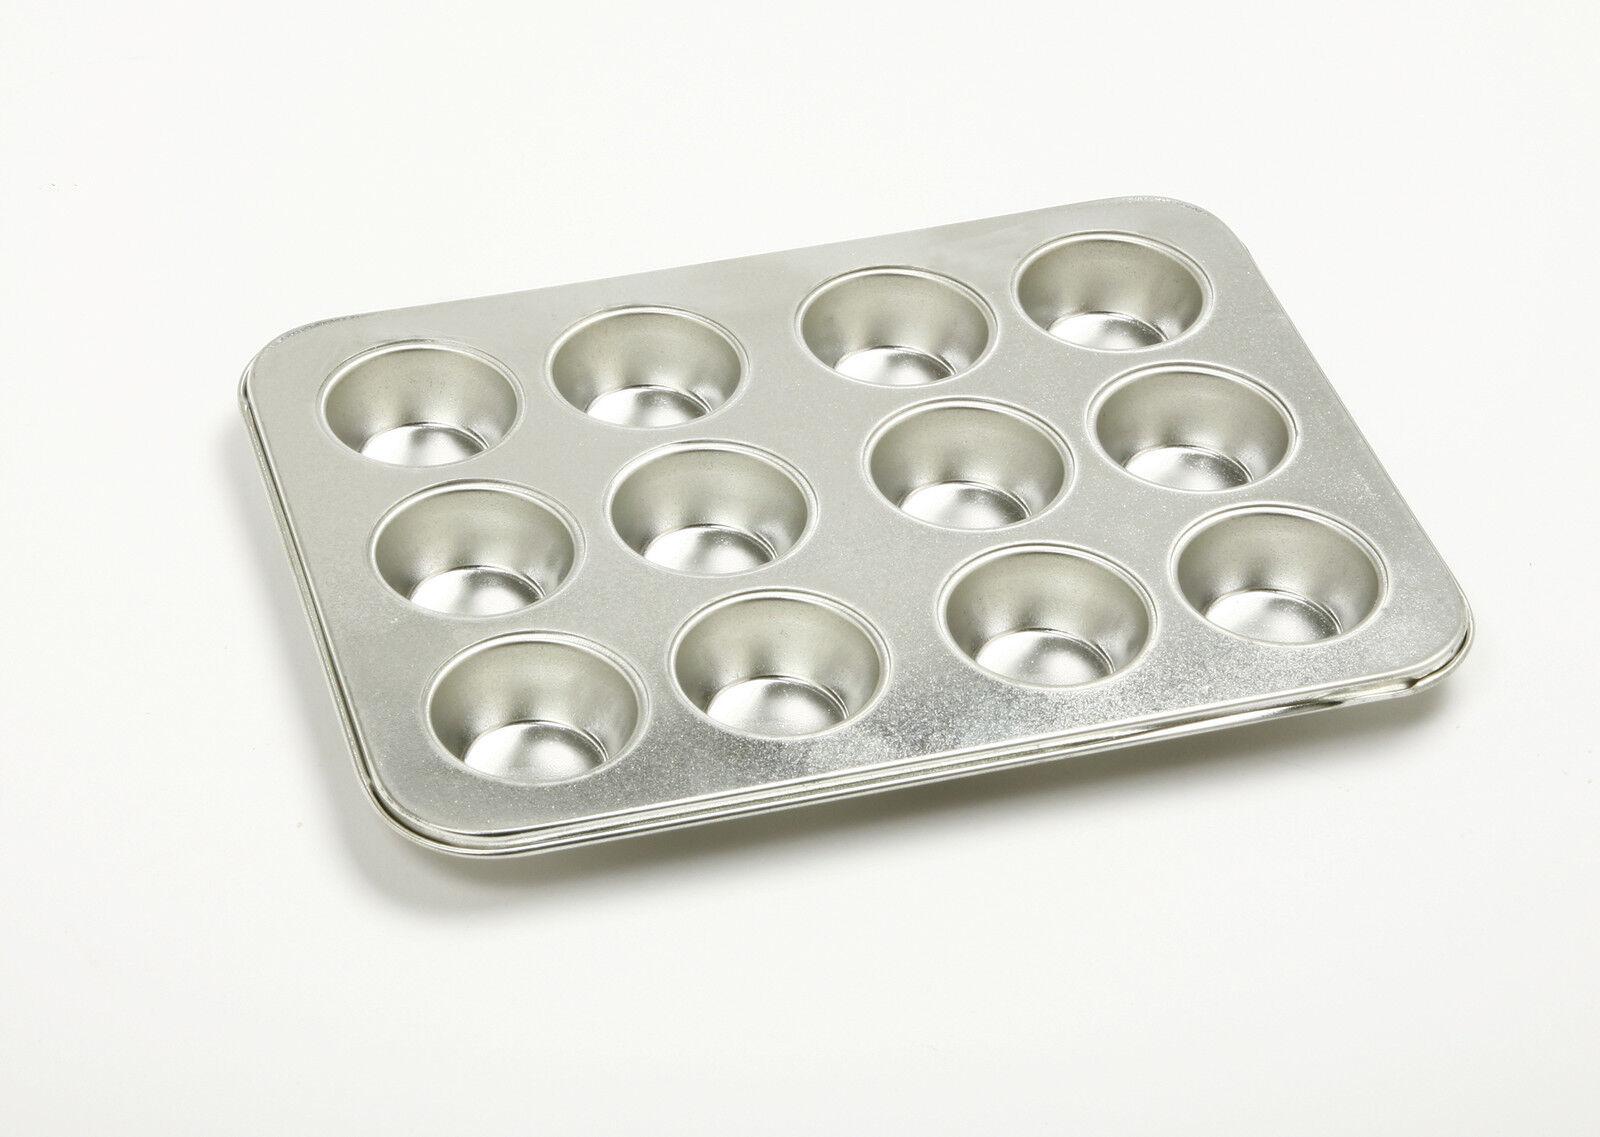 Norpro 3768 Heavy-duty Gauge Tin Mini Muffin Petite Cupcake 12 Cup Pan on Sale